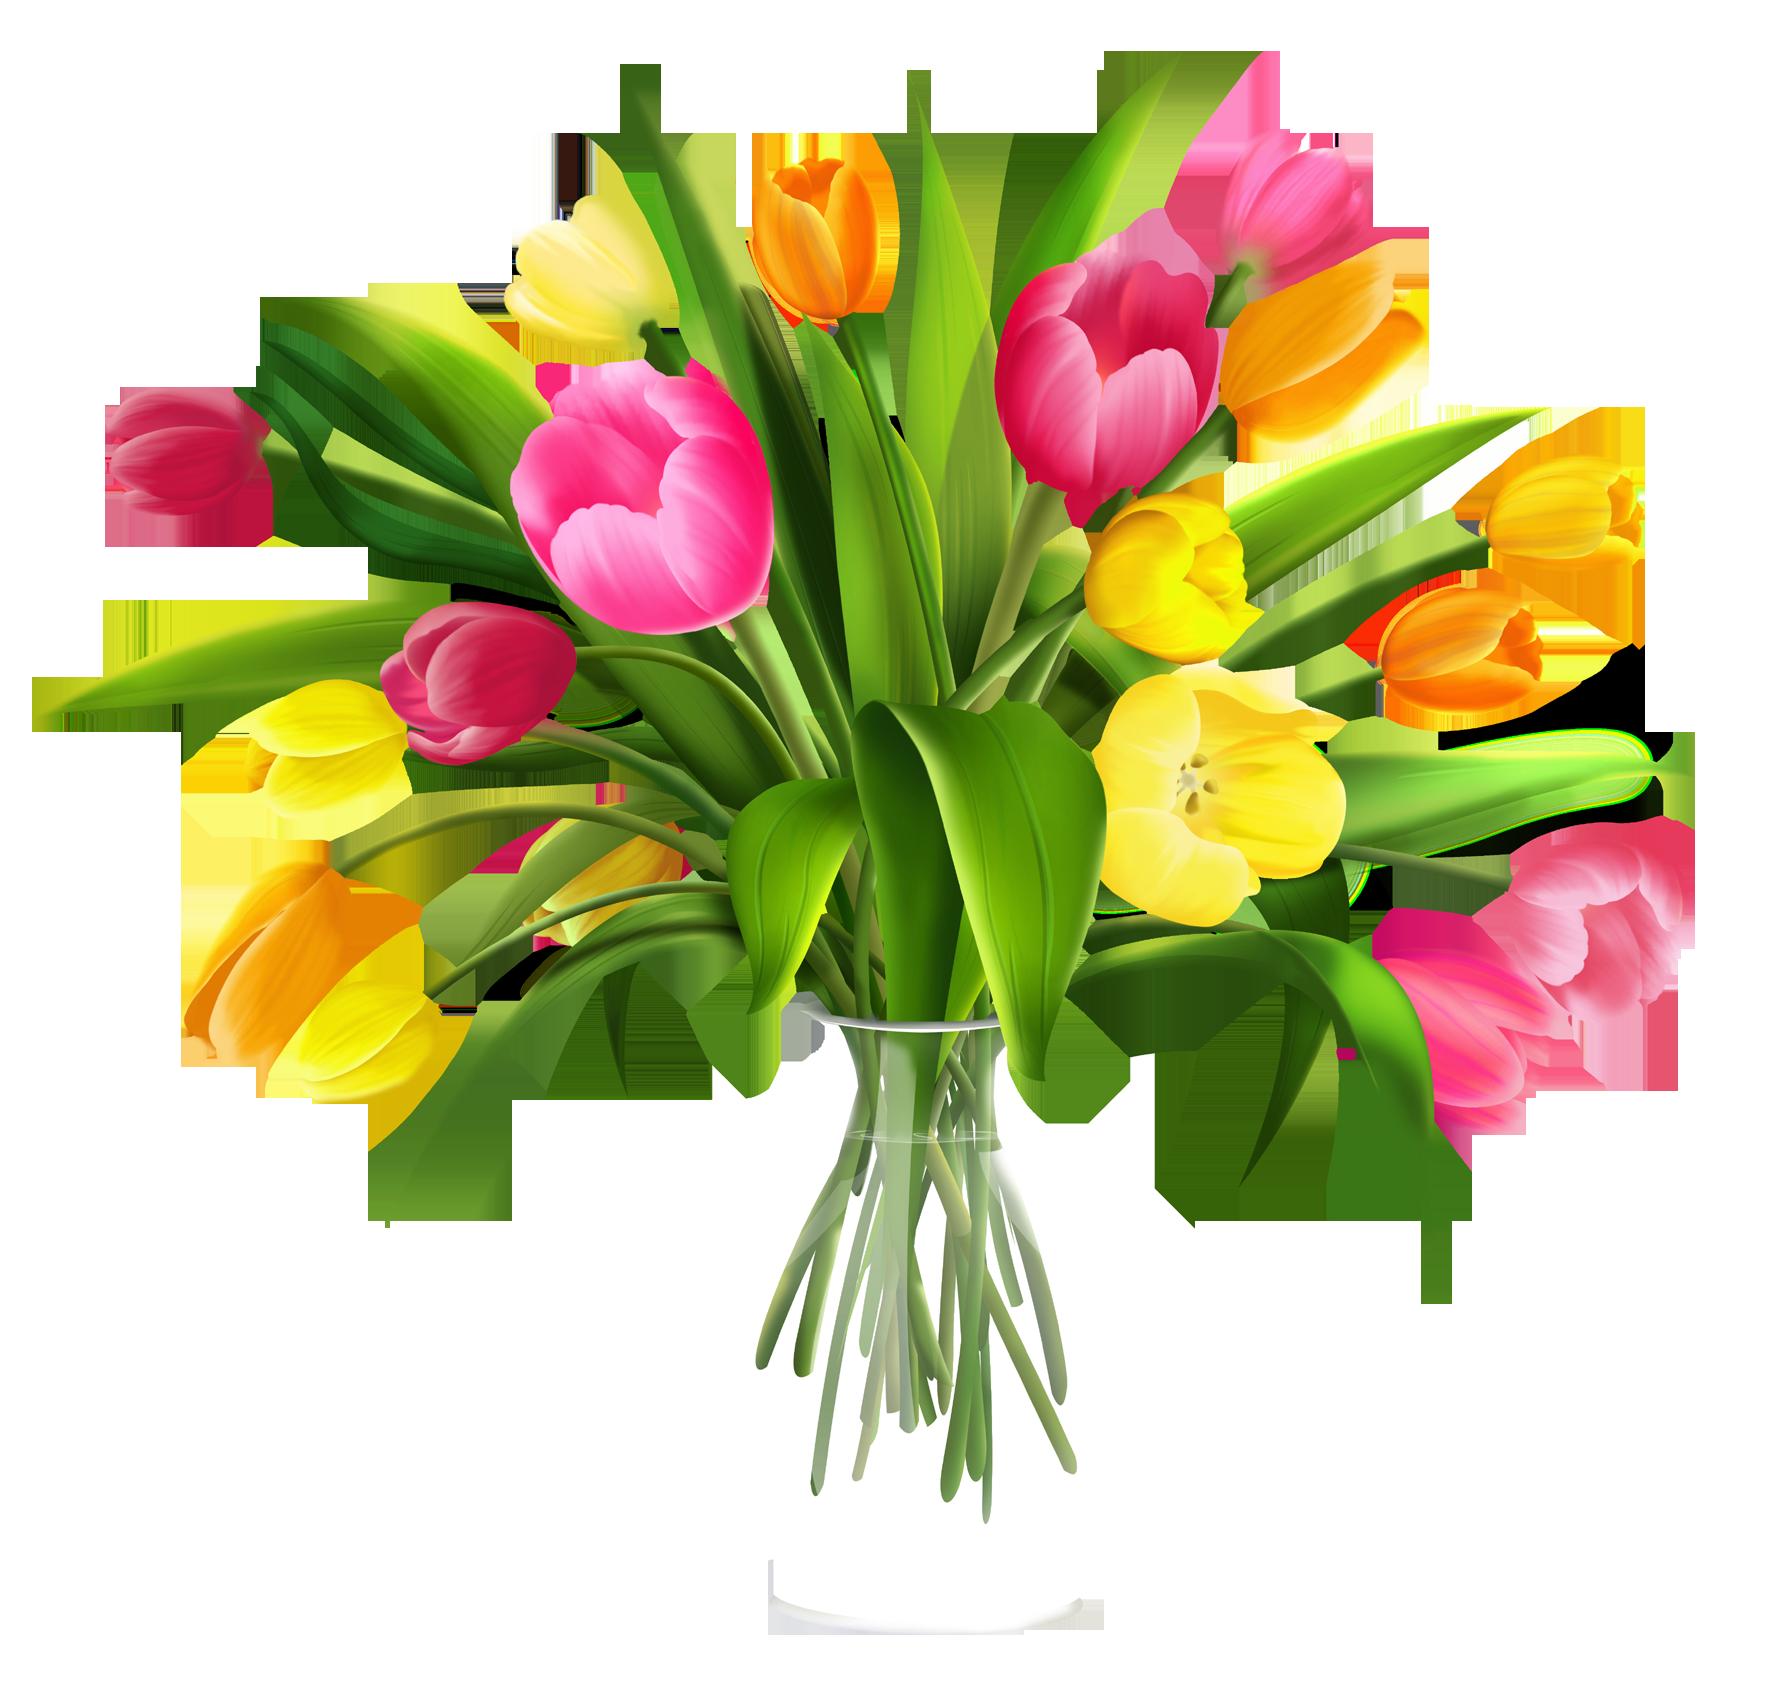 Images for ue flower vase with flowers clipart gardens pinterest